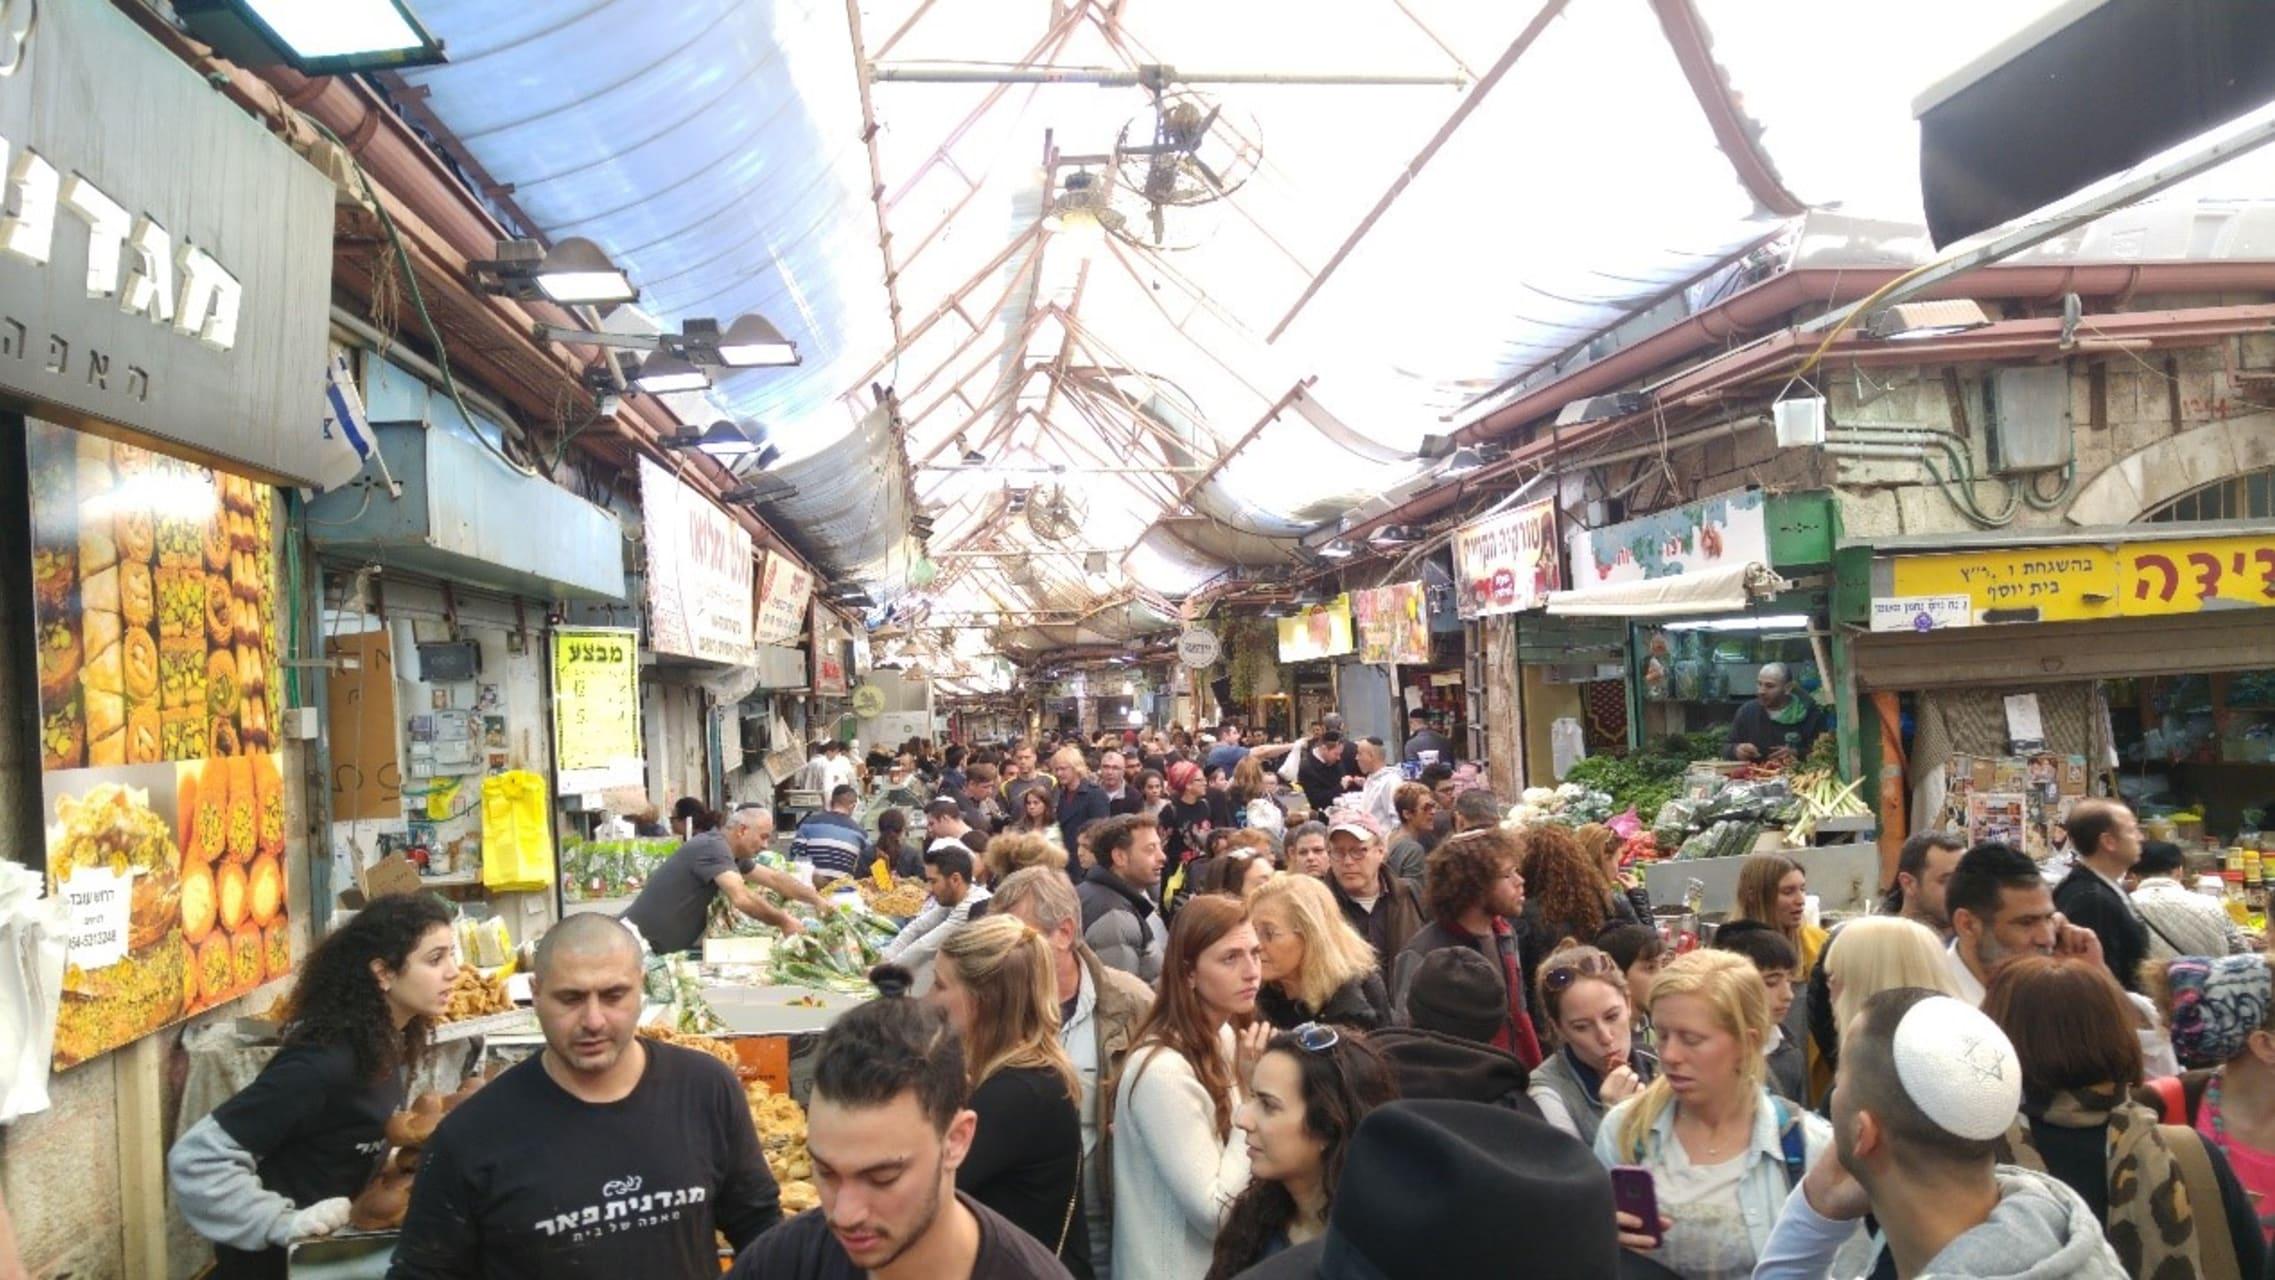 Jerusalem - Machne Yehuda Market – Prepare to drool…